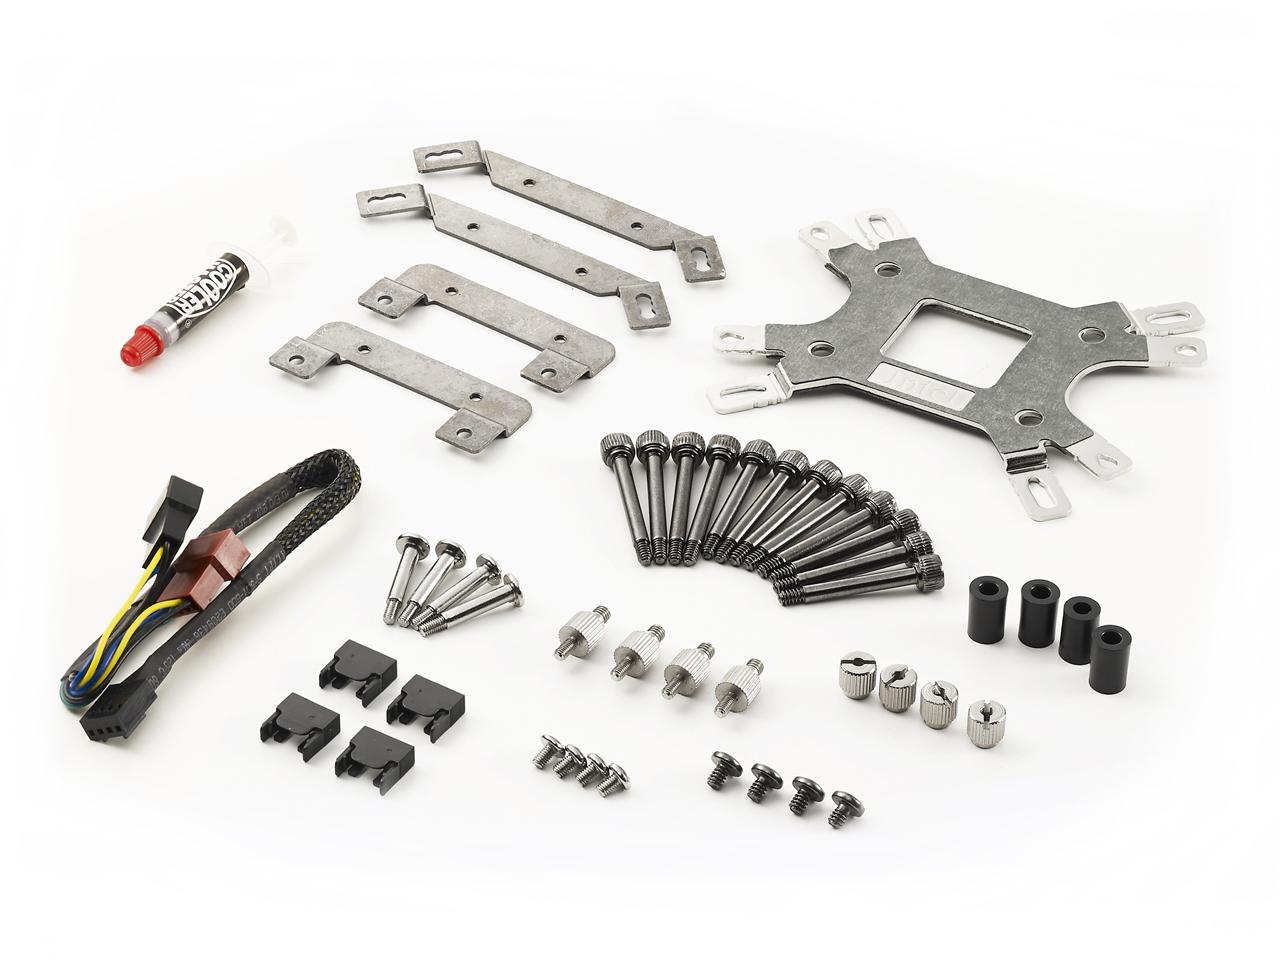 http://prohardver.hu/dl/cnt/2014-01/105160/32_product_nepton_accessories.jpg